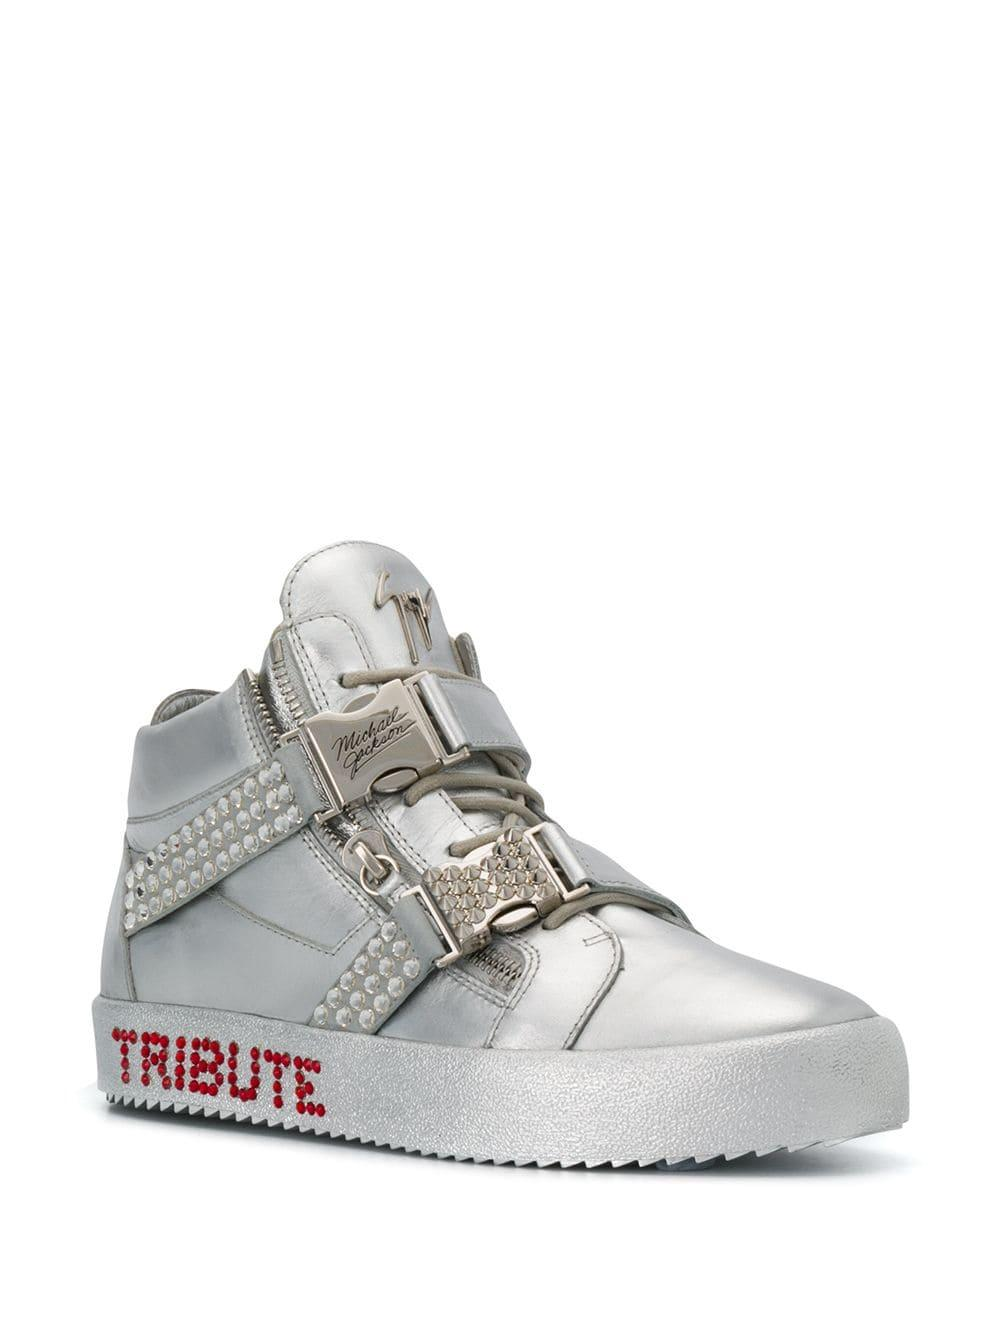 b221c5ae8f4c6 Giuseppe Zanotti Tribute High Sneakers in Metallic for Men - Save 18% - Lyst